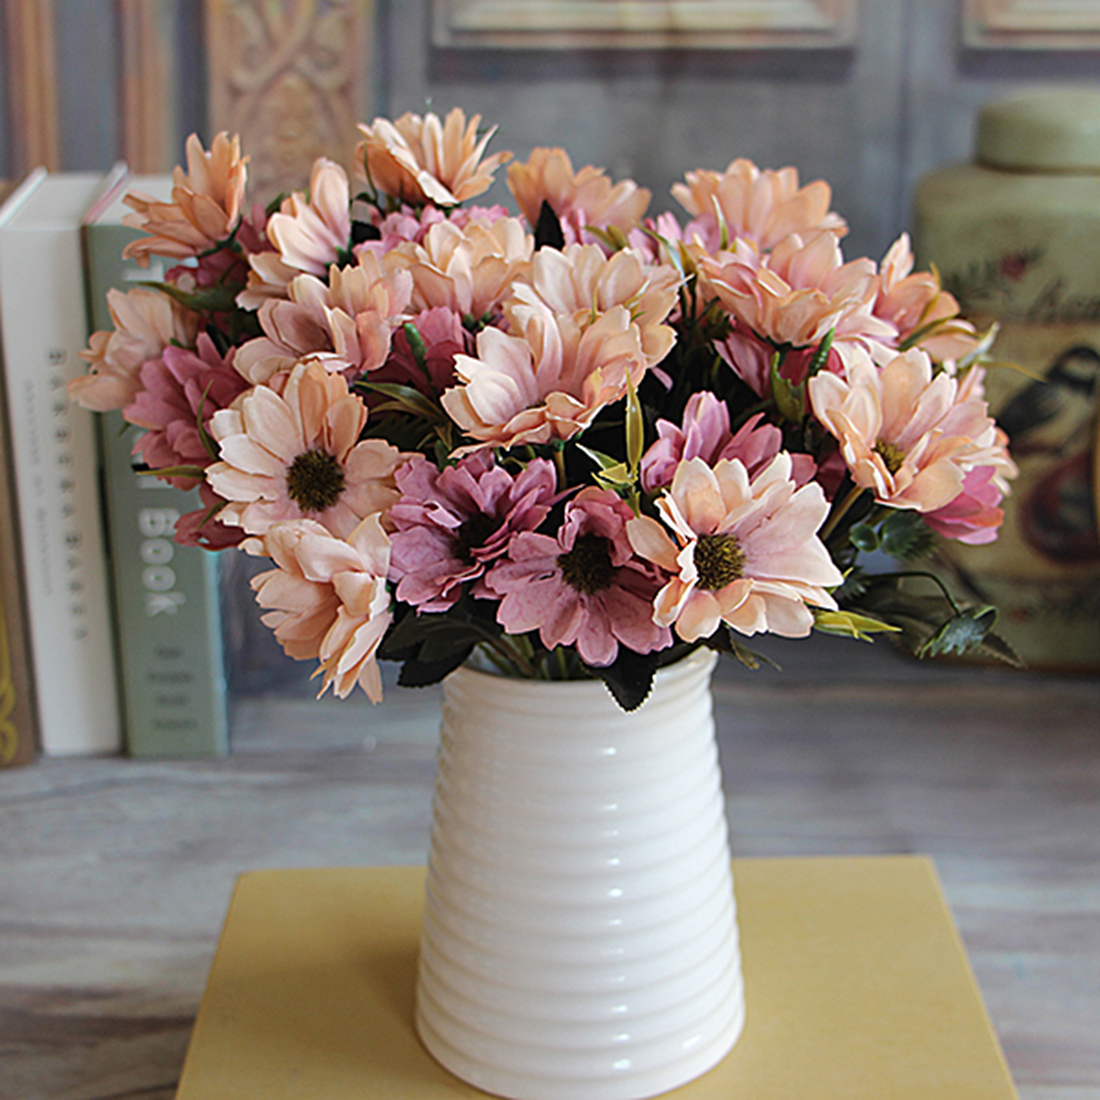 6 Branches 10 Head Floral Artificial Flower Bouquet Silk Flowers